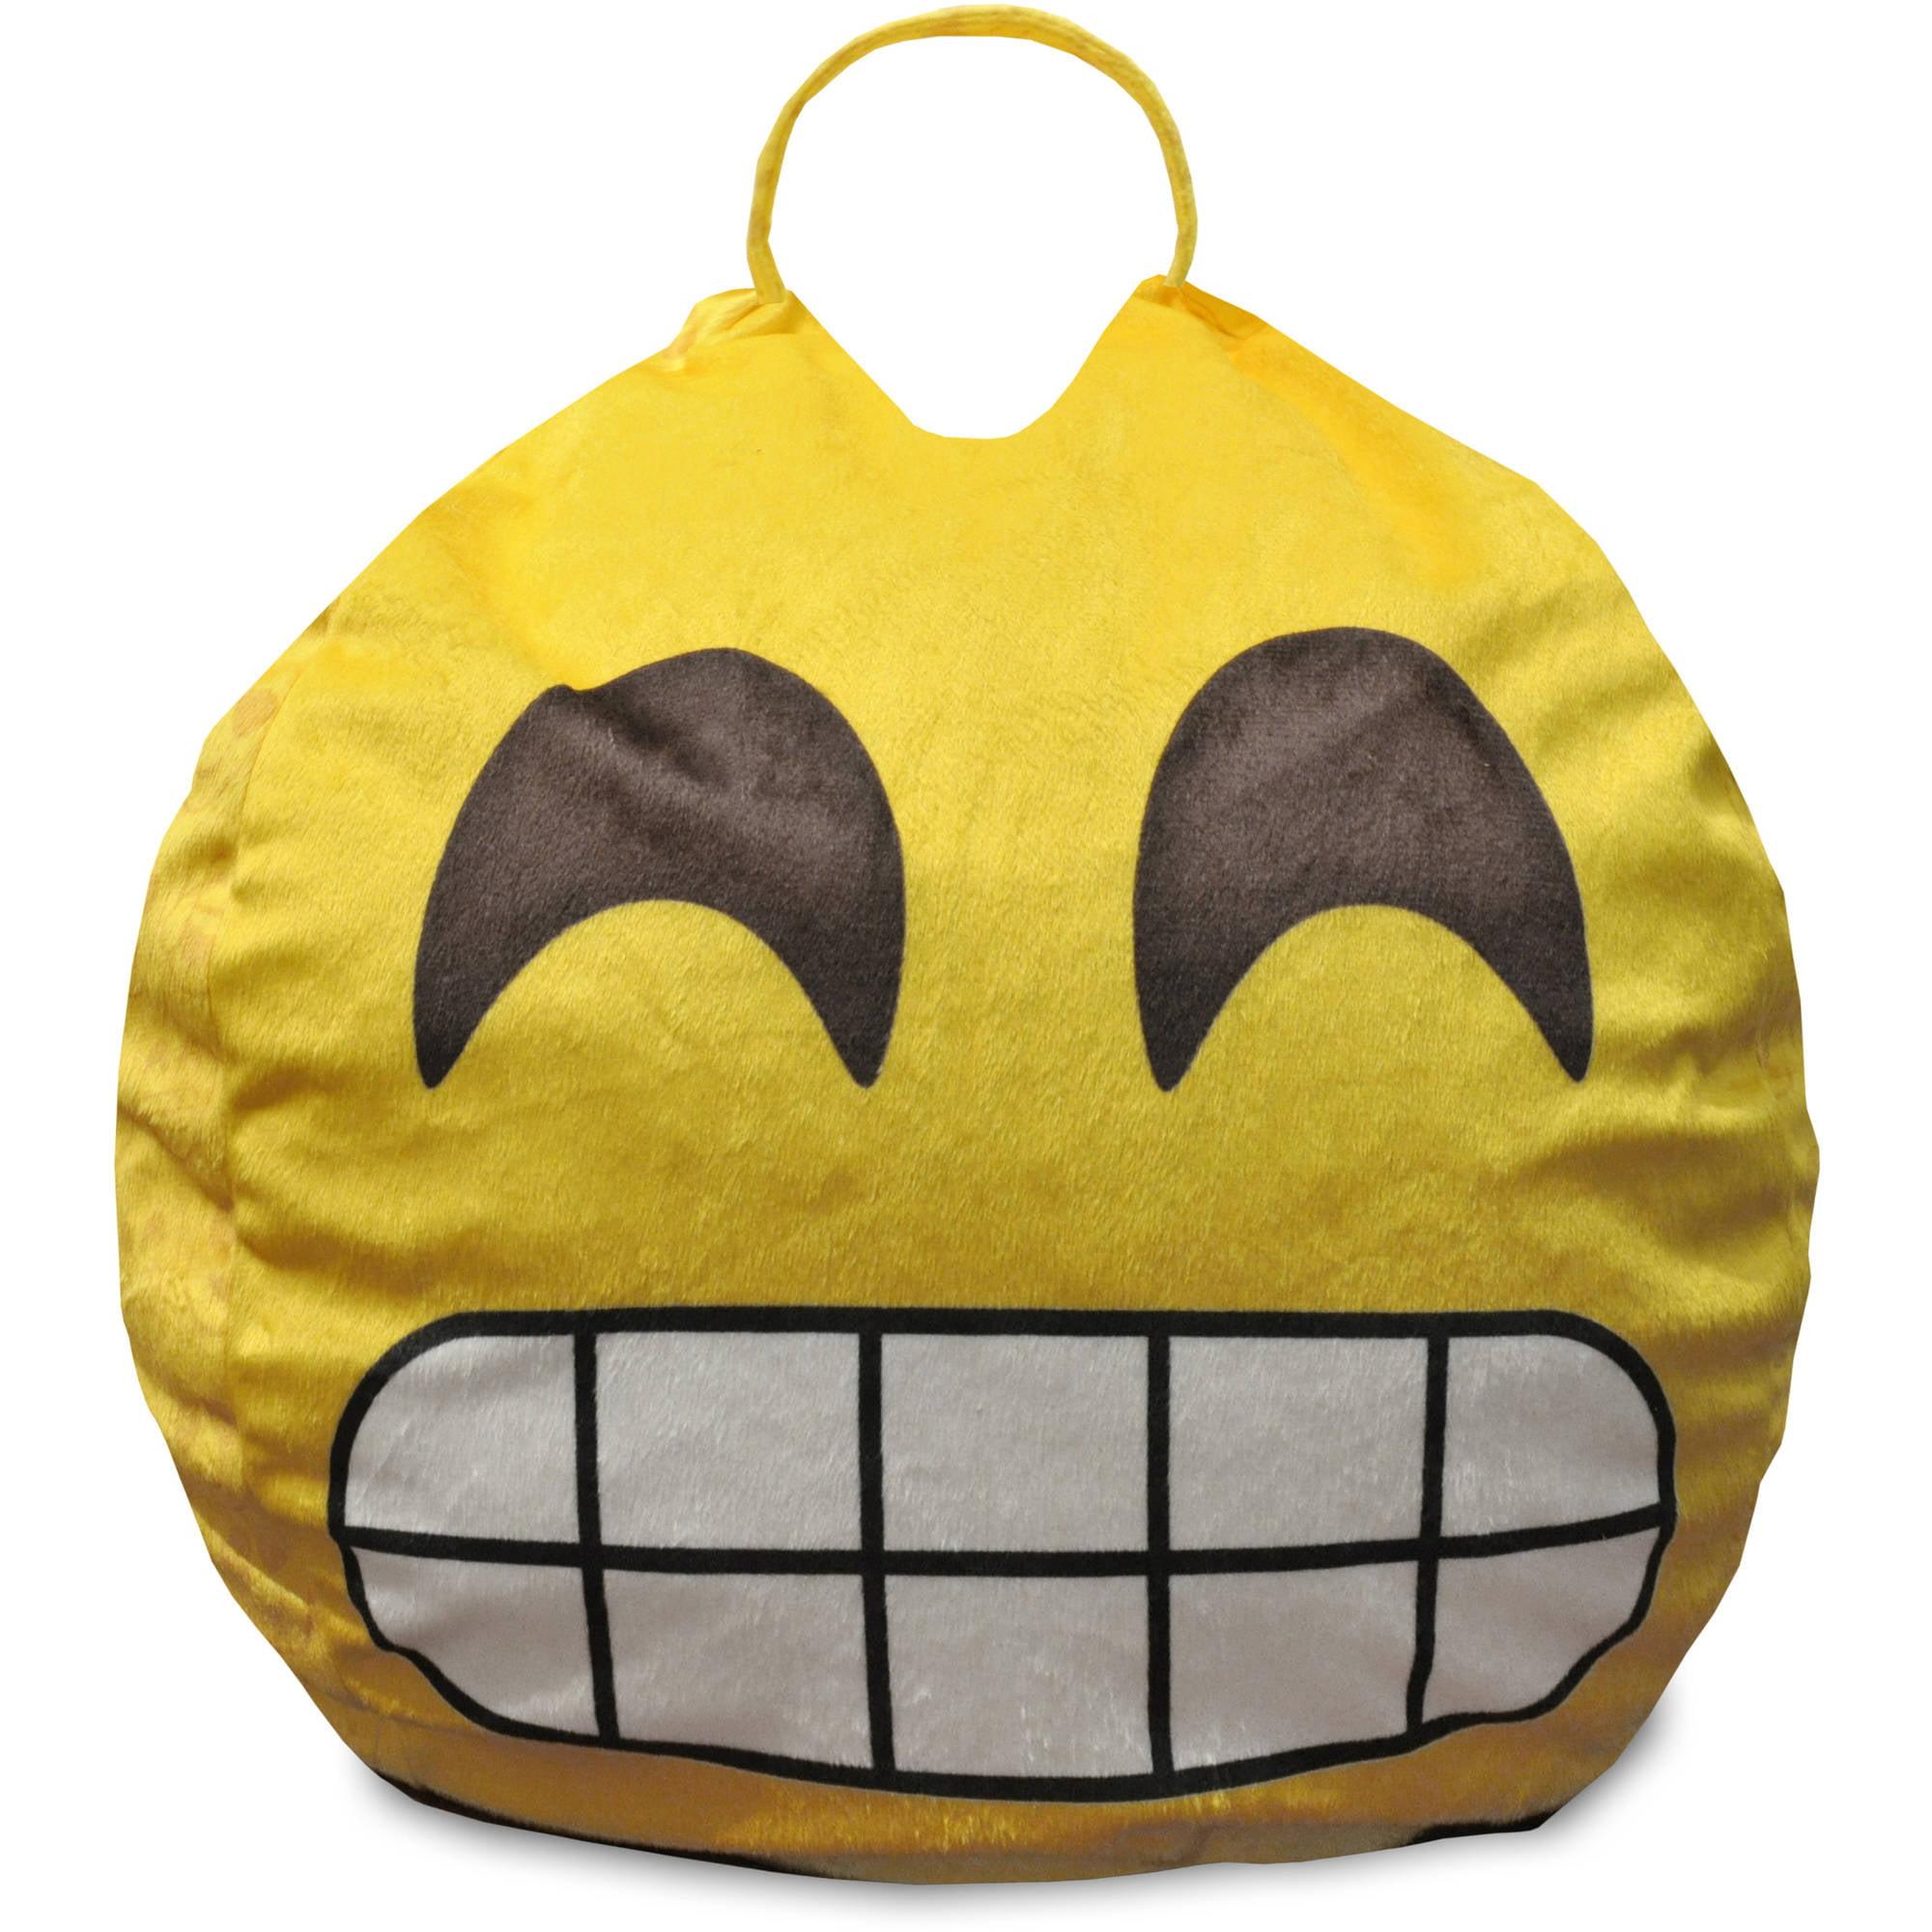 Emoji Pals Flawless Mini Bean Bag with Handle